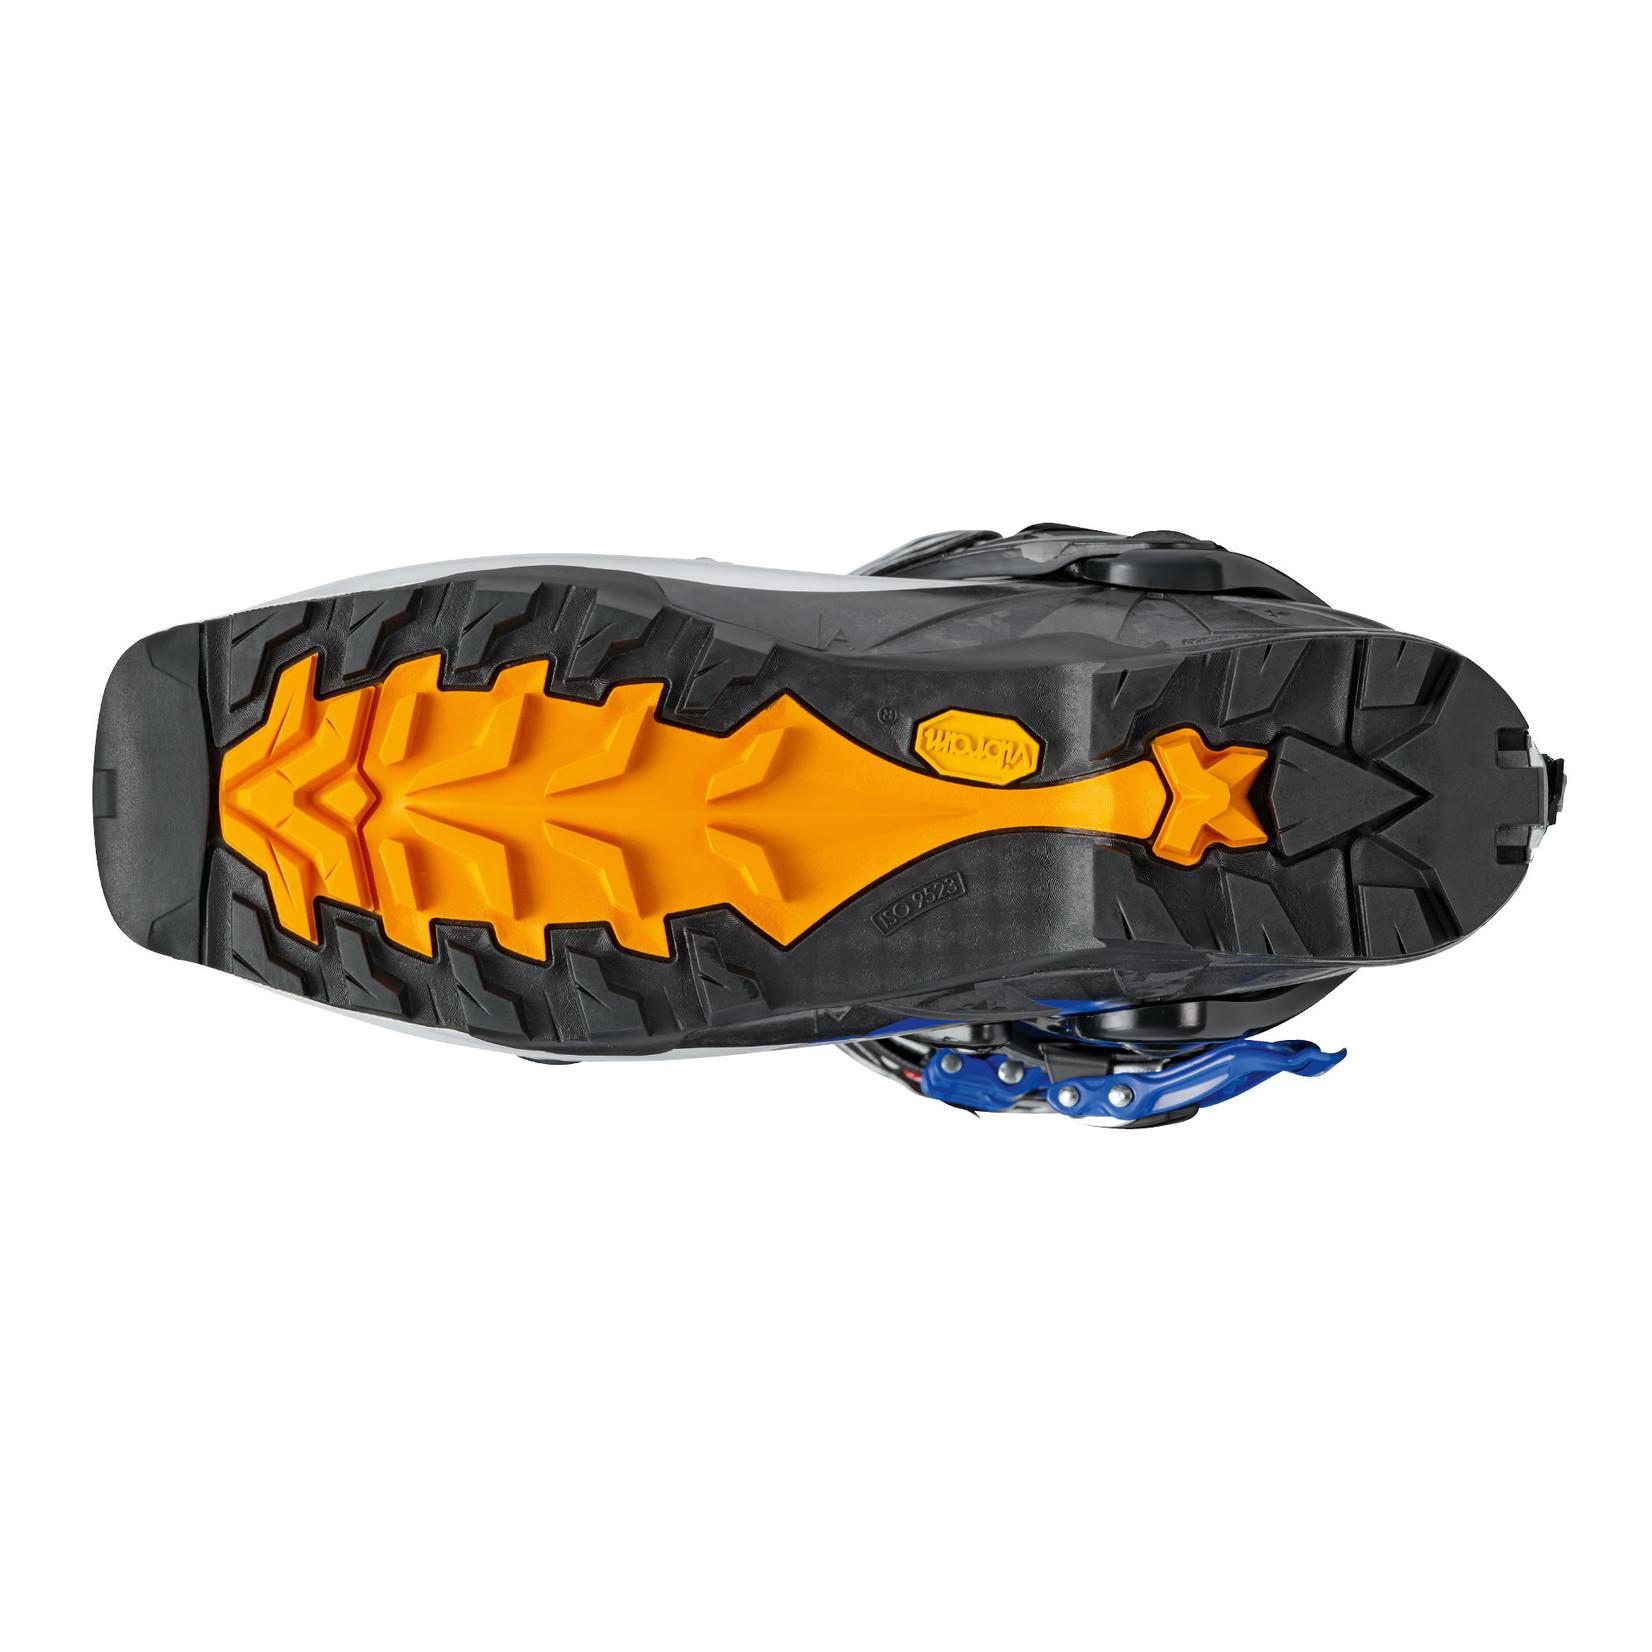 Scarpa Maestrale RS F20 Ski Boot